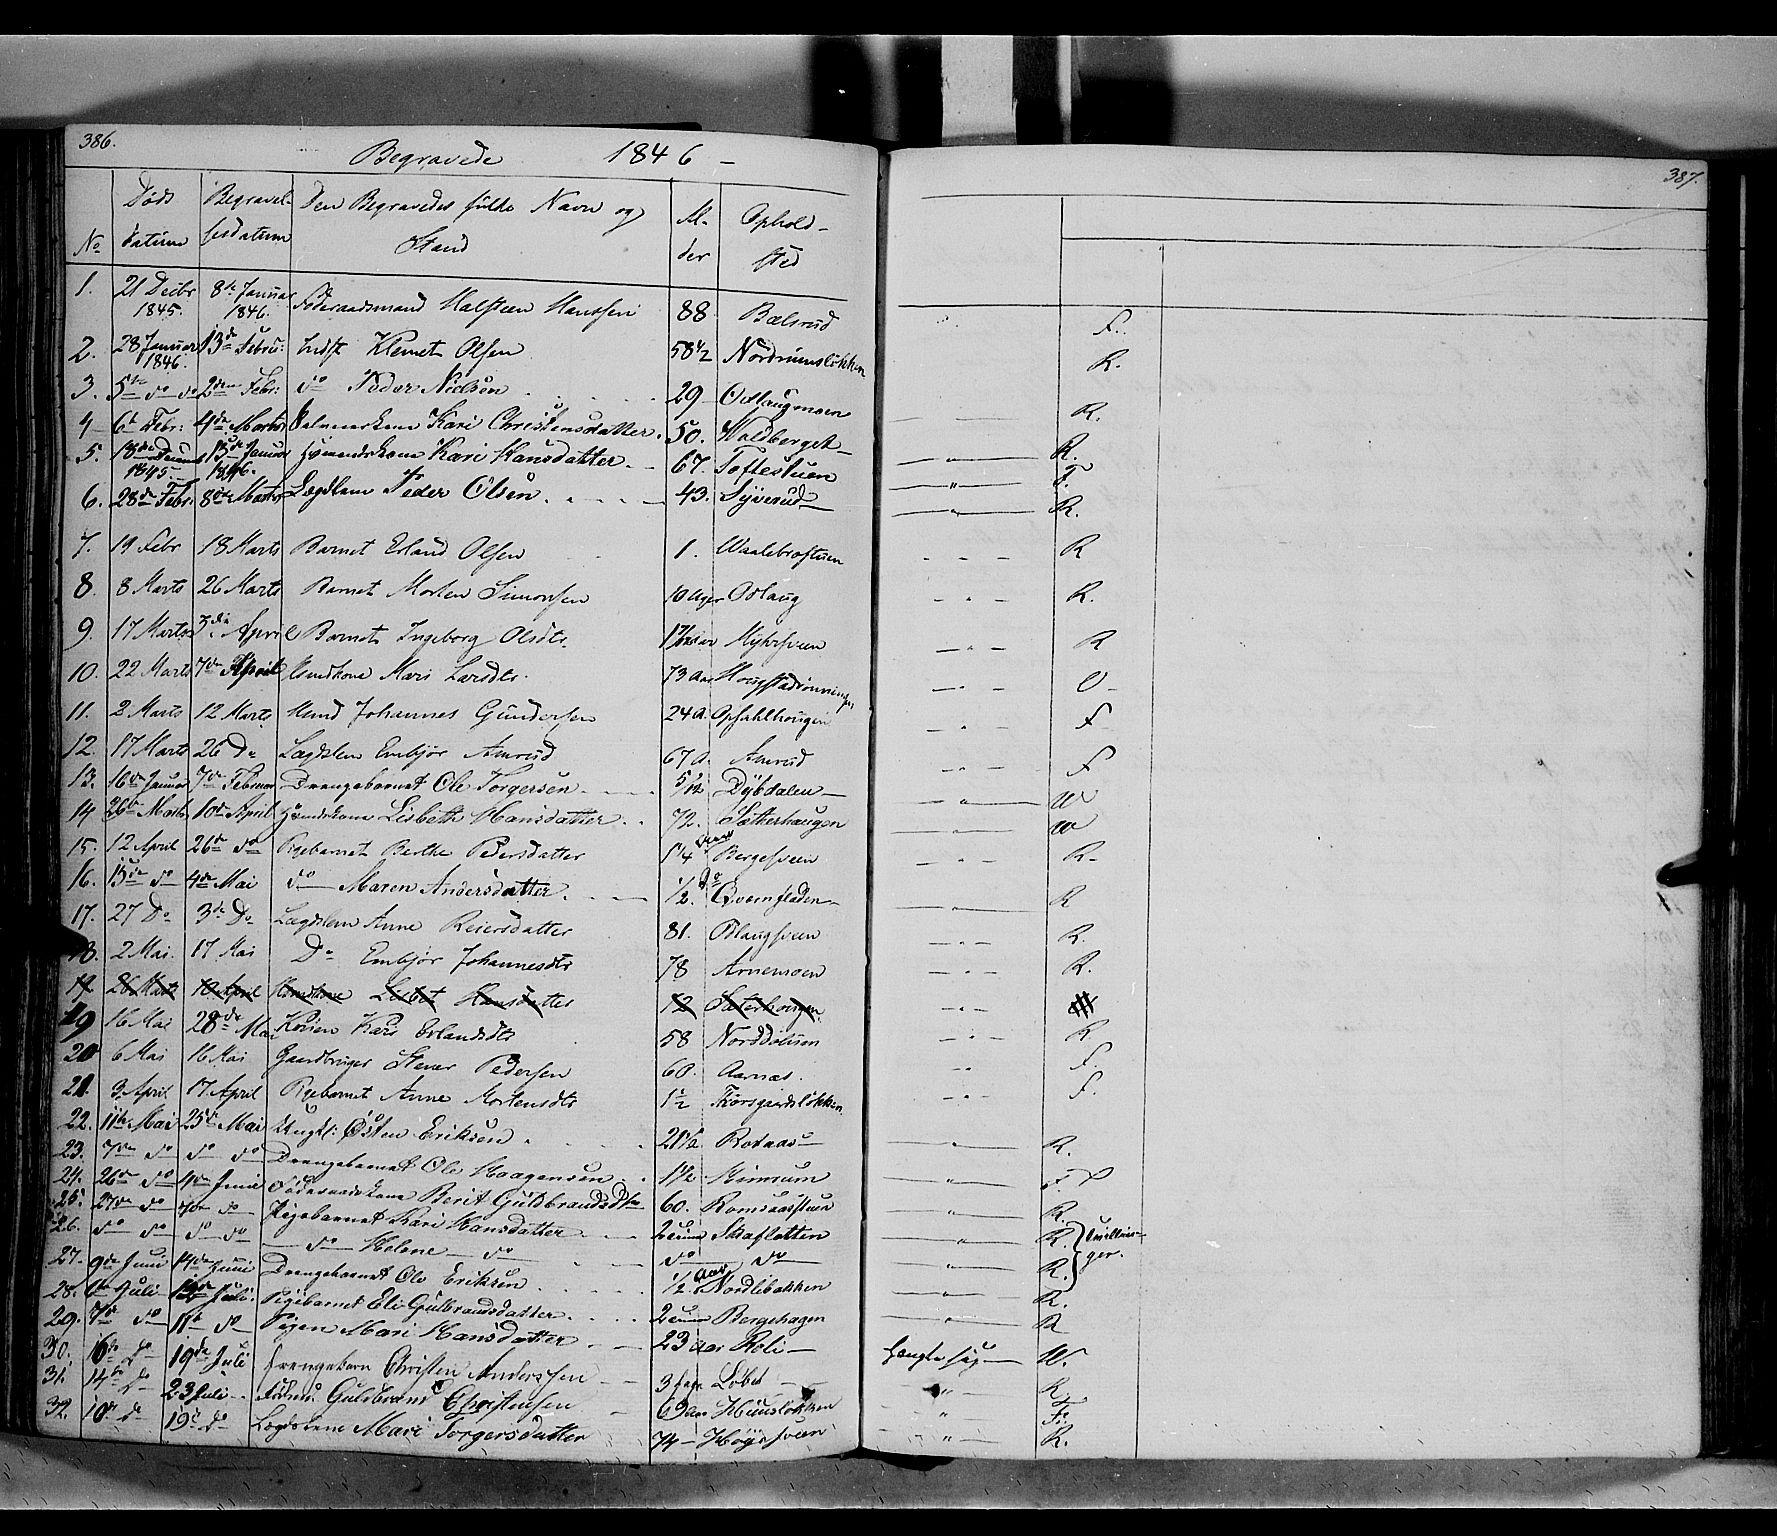 SAH, Ringebu prestekontor, Ministerialbok nr. 5, 1839-1848, s. 386-387